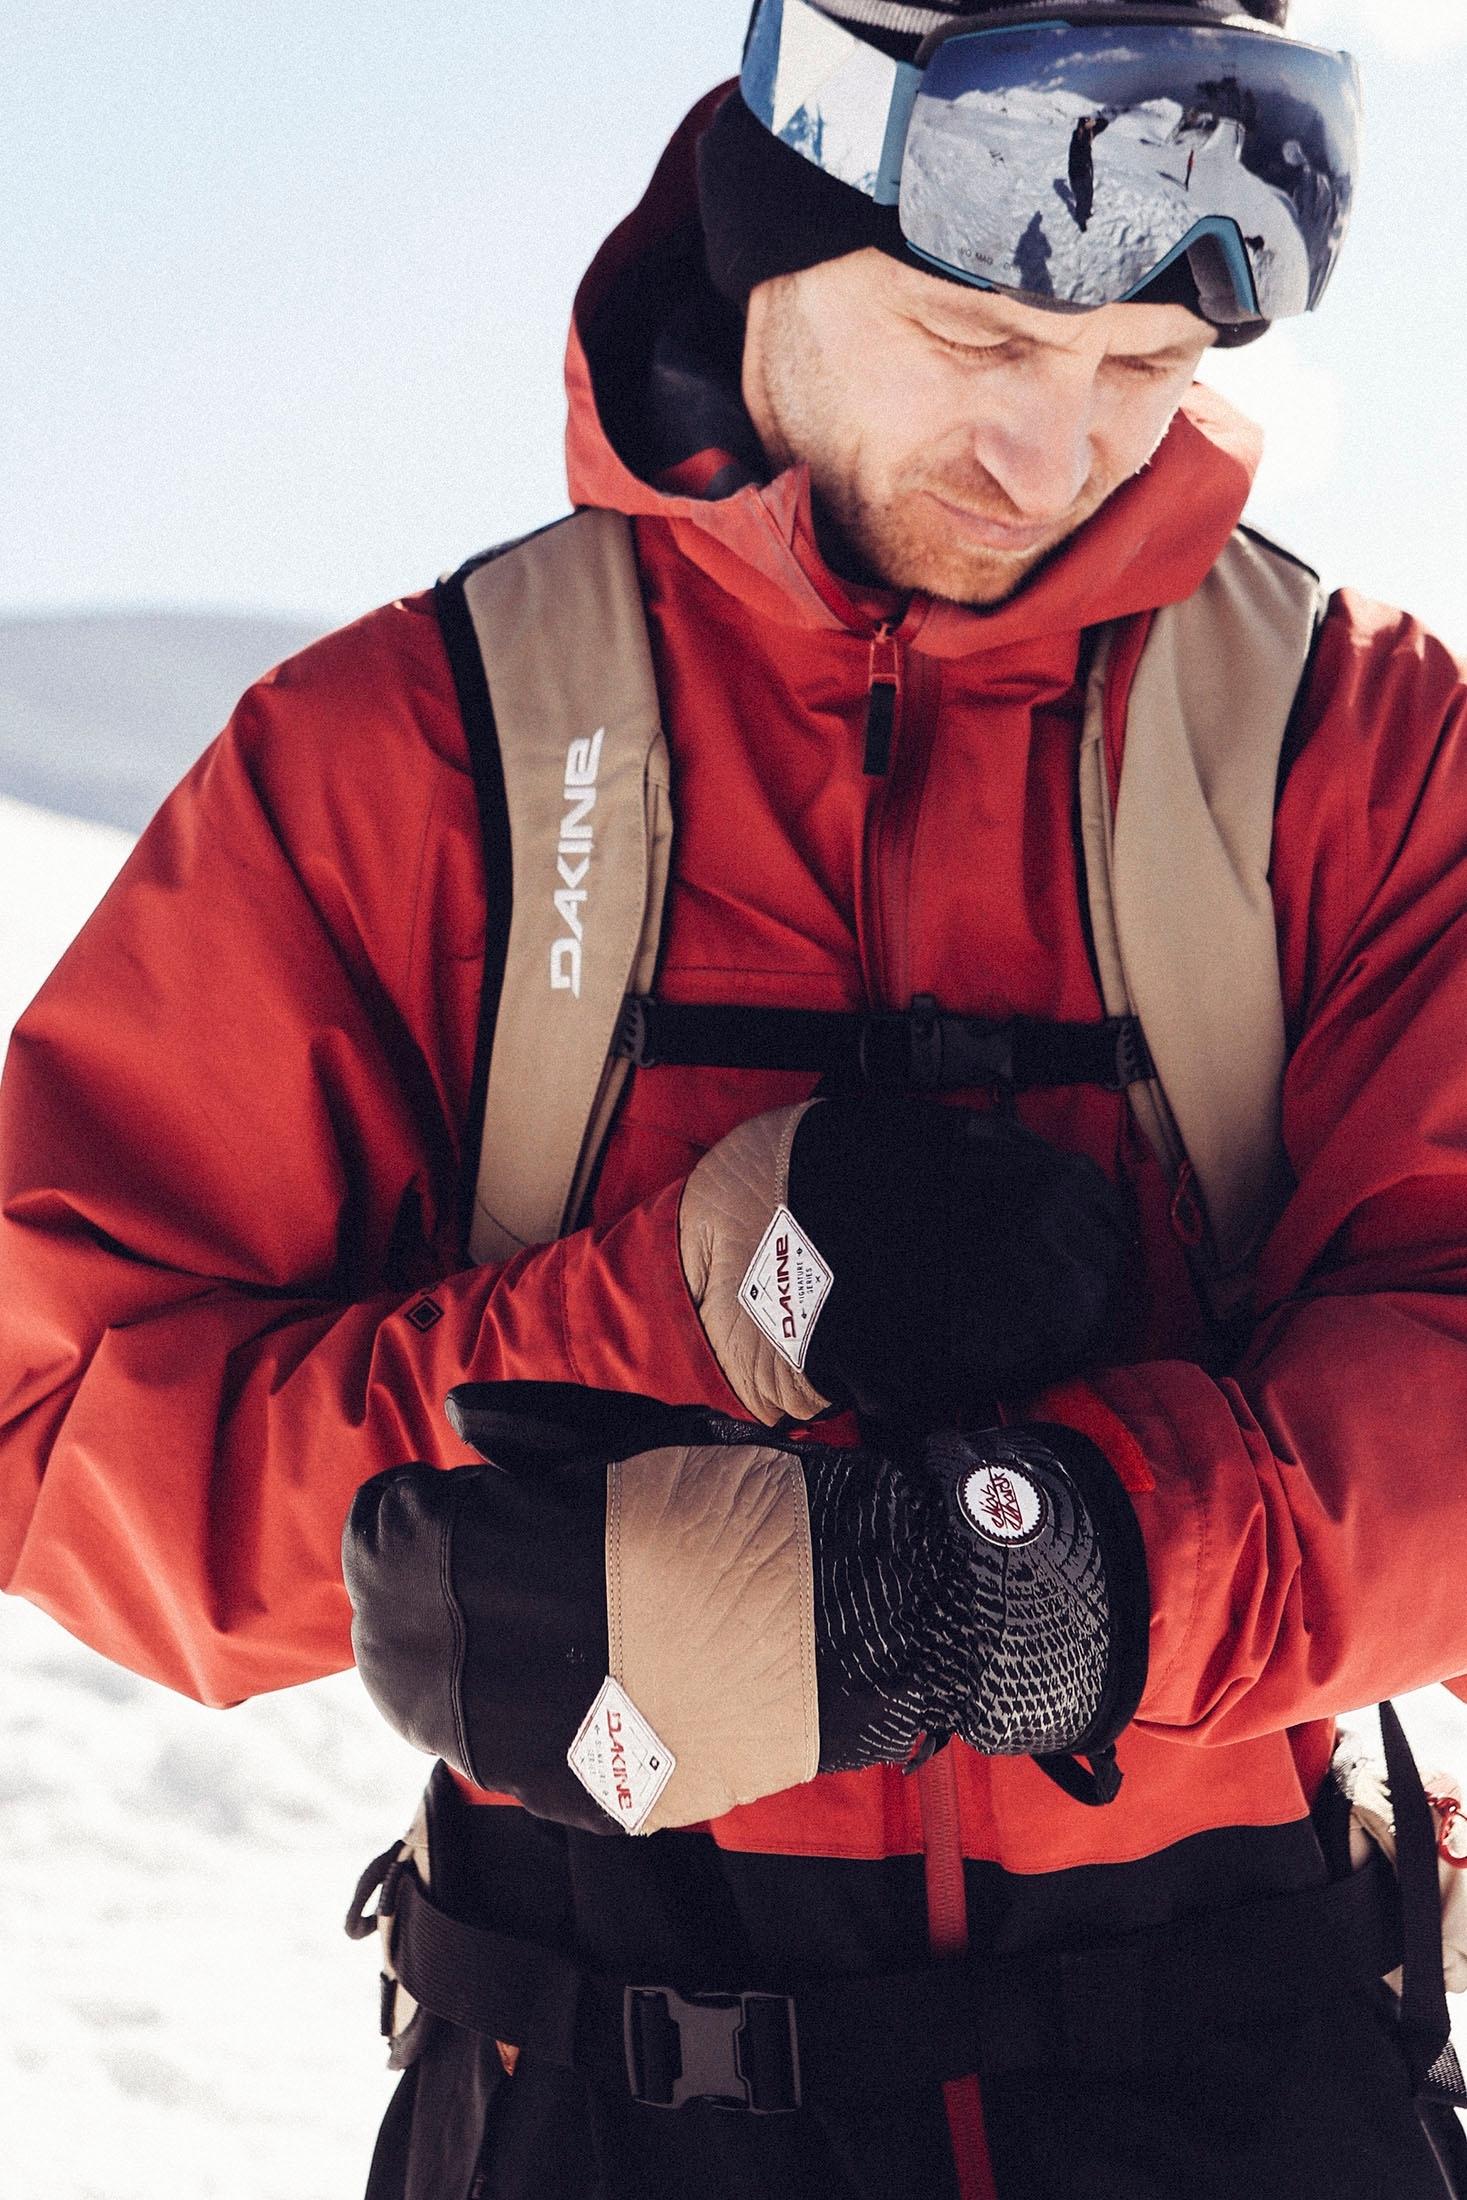 Dakine Team Poacher 22 Litre Ski Snow Back Pack Ruck Sack Elias Elhardt